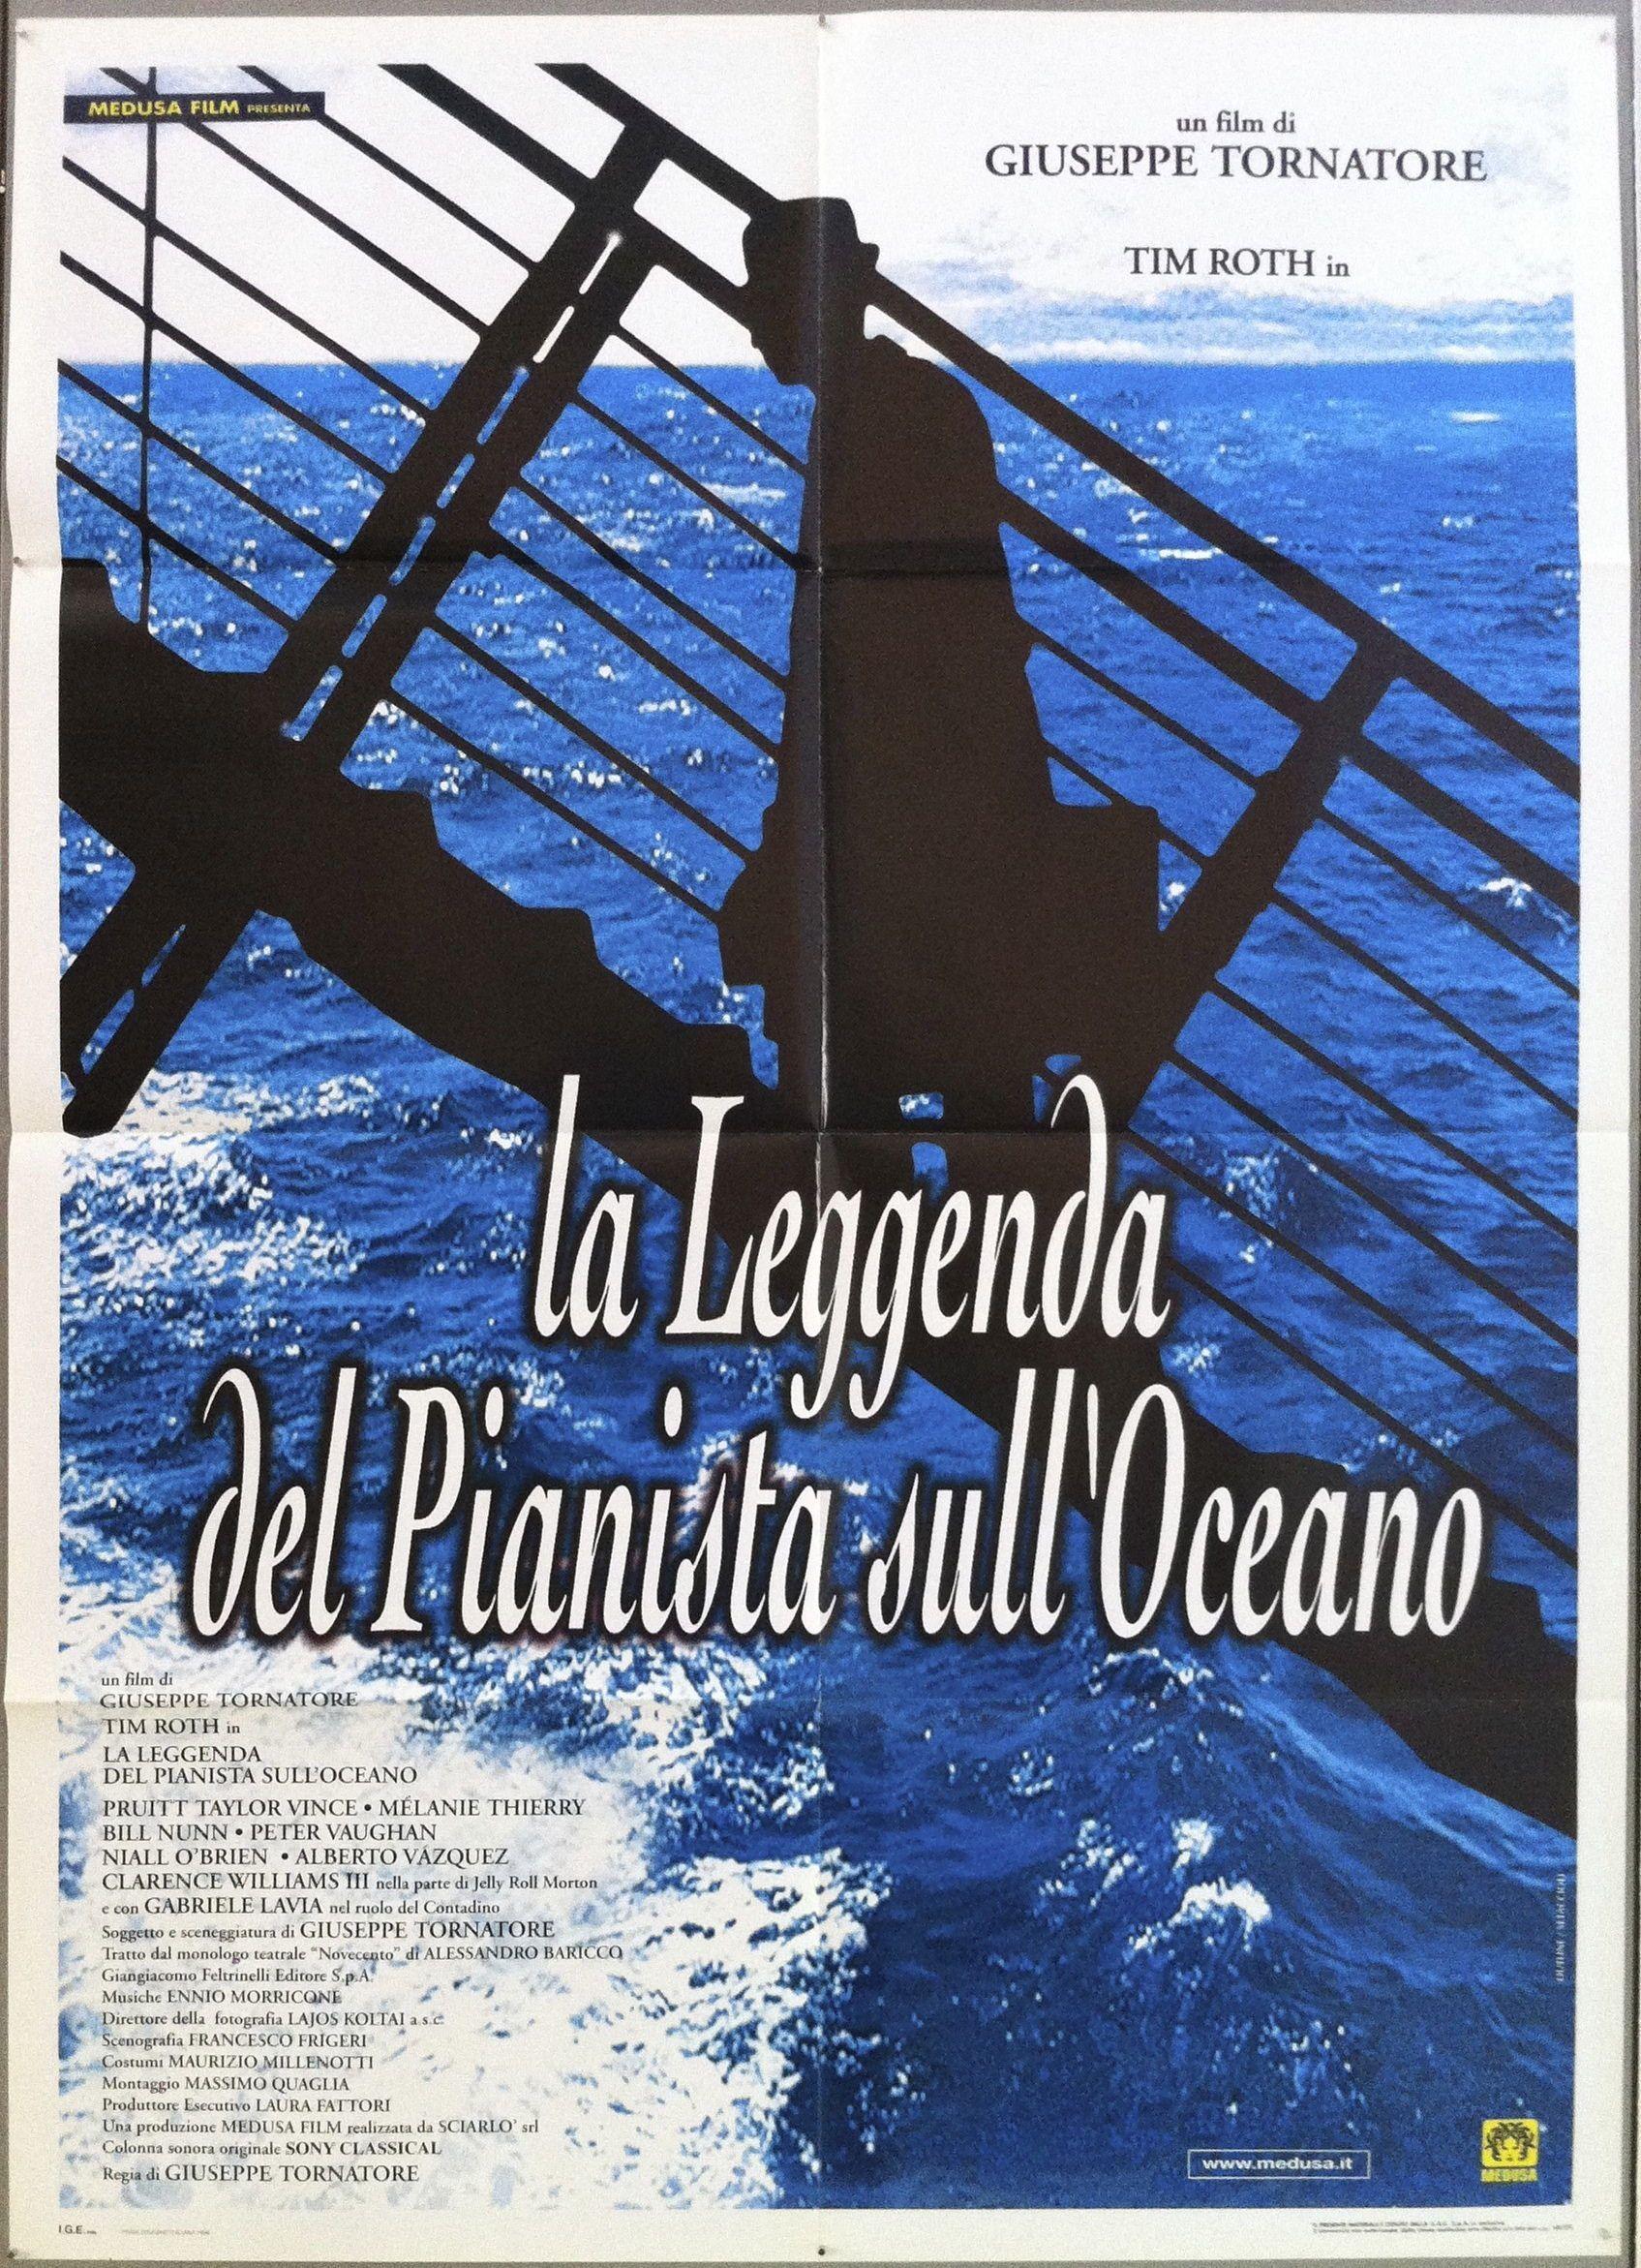 La Leggenda Del Pianista Sull'oceano : leggenda, pianista, sull'oceano, Leggenda, Pianista, Sull'Oceano, Movie, Posters,, Memorabilia,